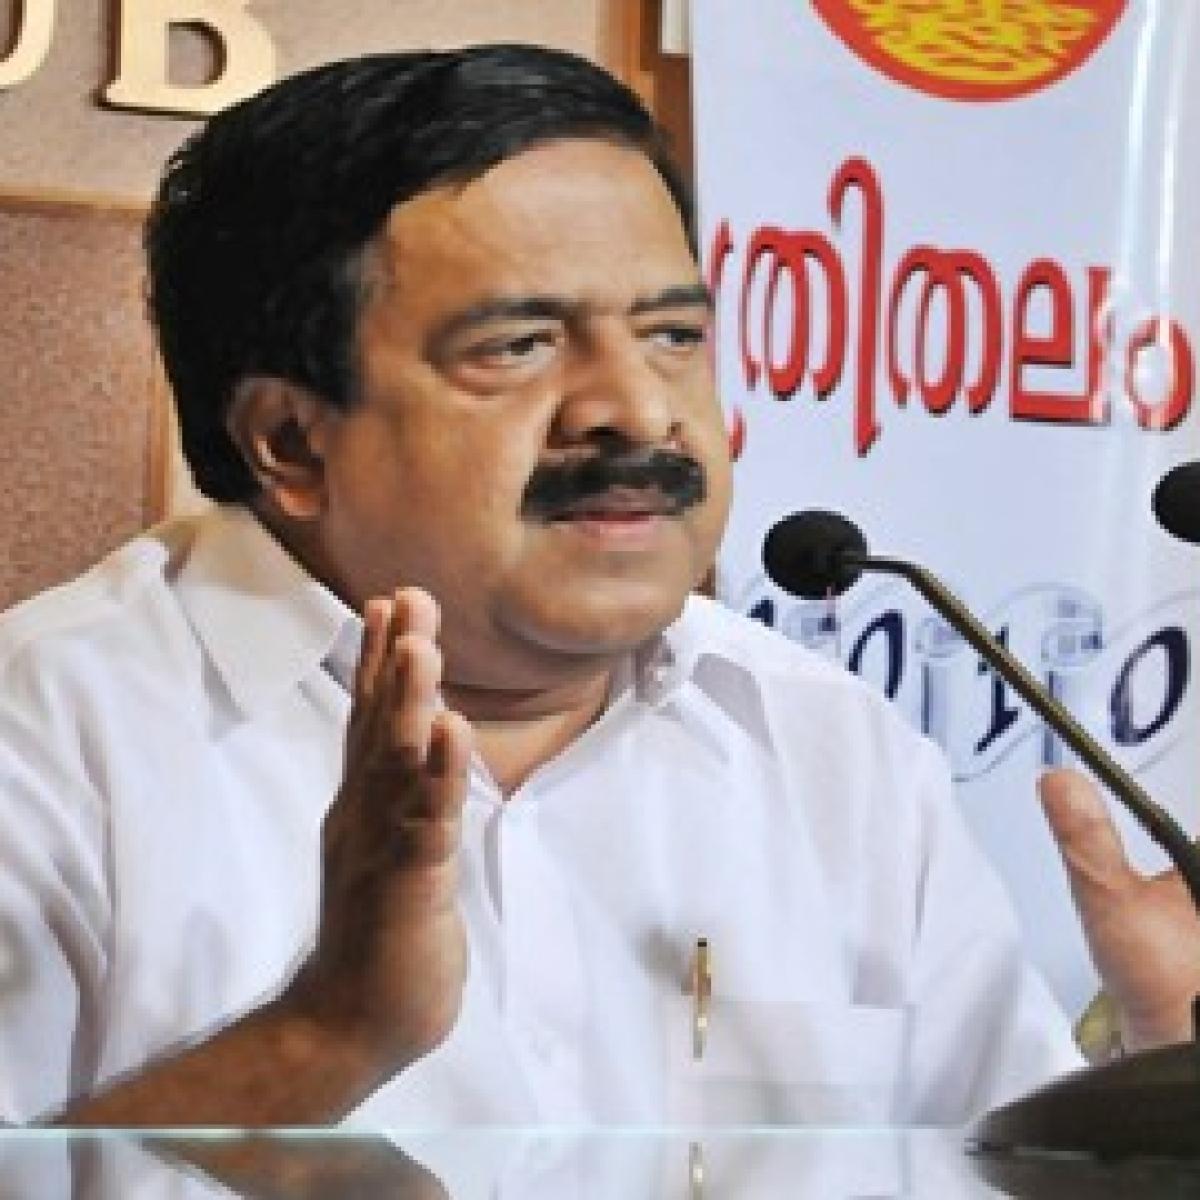 Congress leader Ramesh Chennithala alleges Kerala CM Vijayan trying to implement CAA, NPR secretly